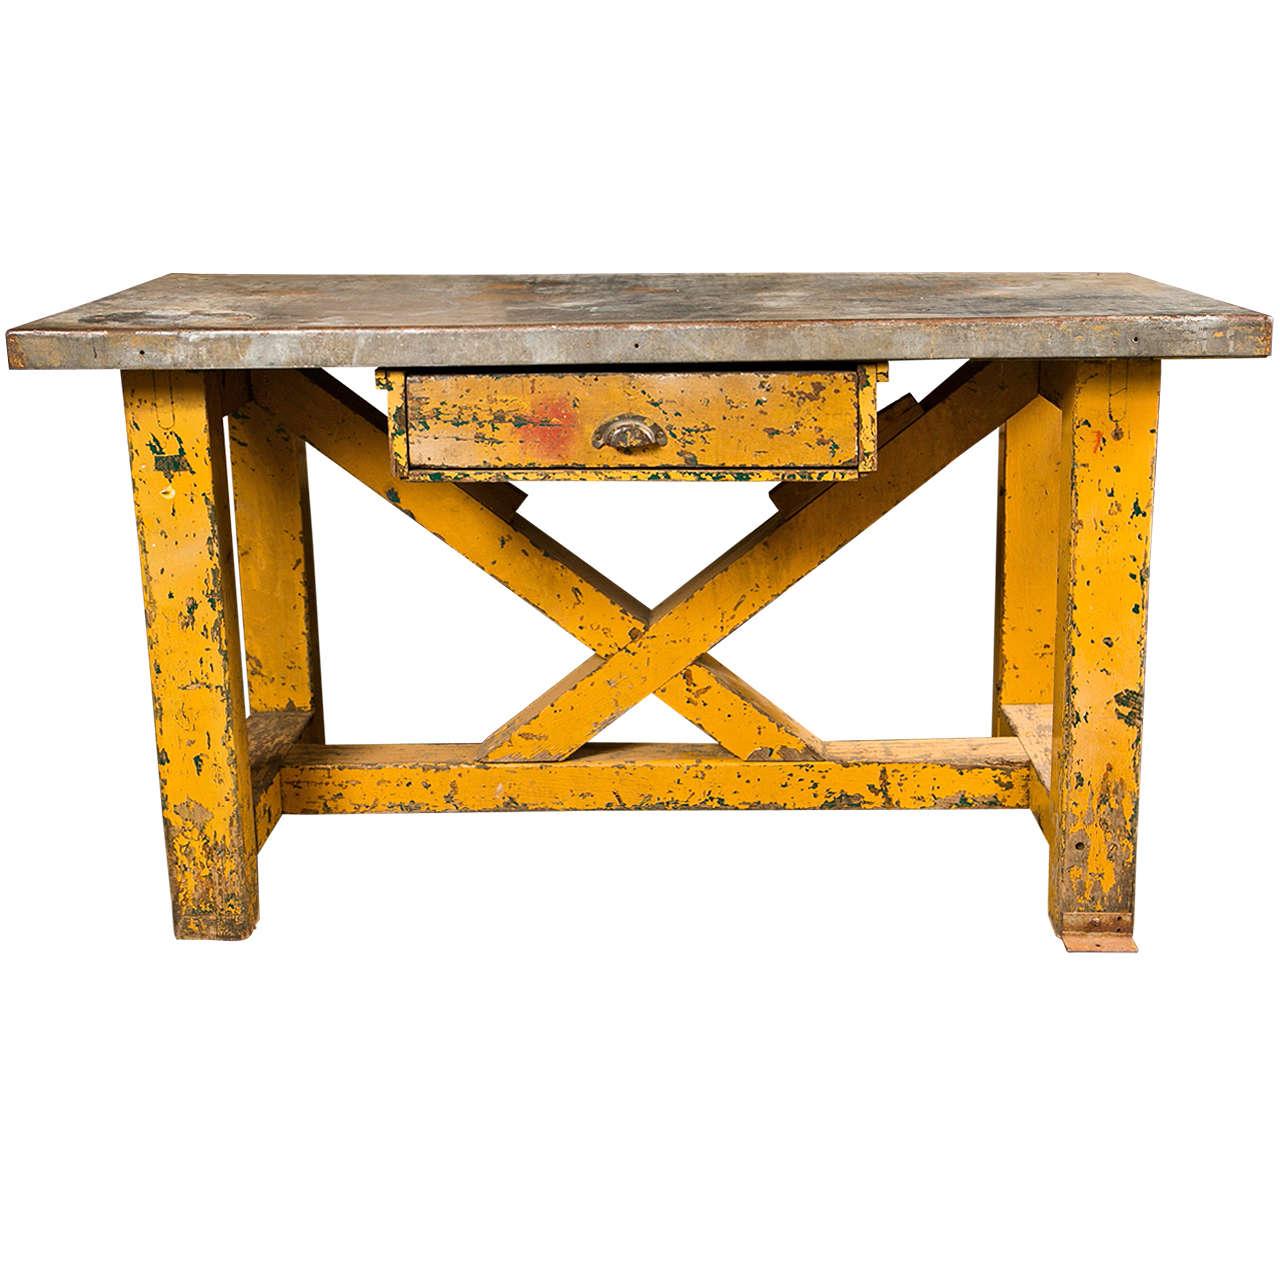 vintage american zinc top factory work table, c. 1920-40 at 1stdibs